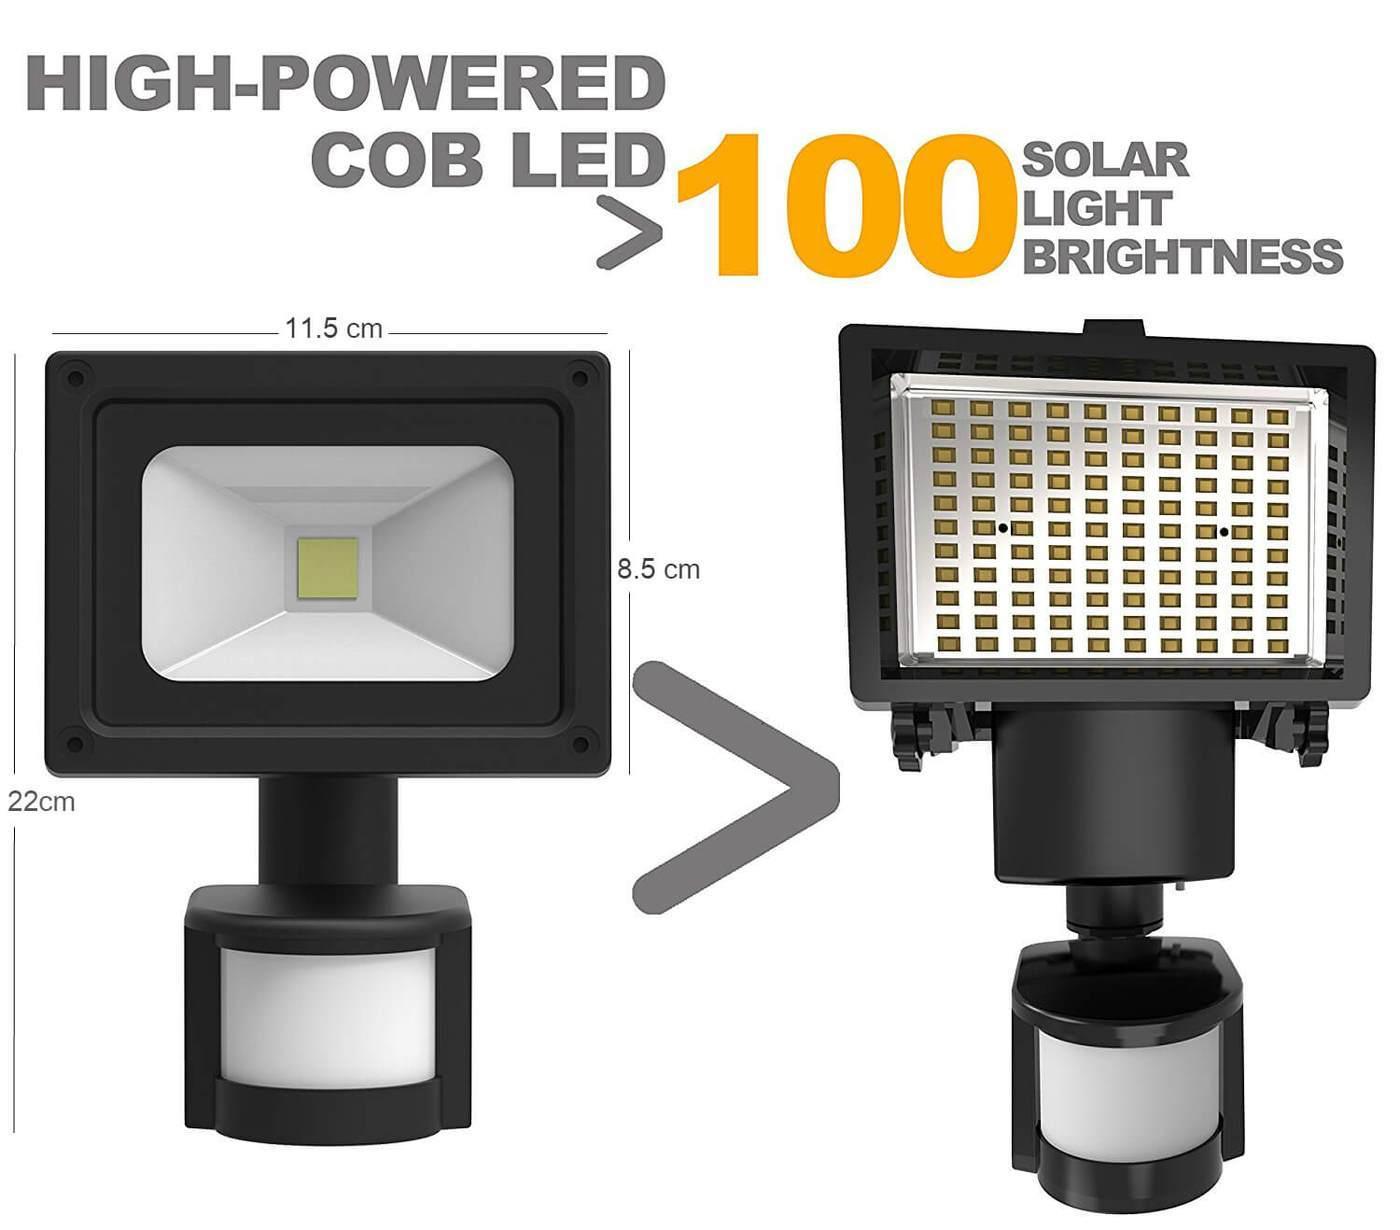 5W COB SOLAR LED MOTION SENSOR SECURITY LAMP